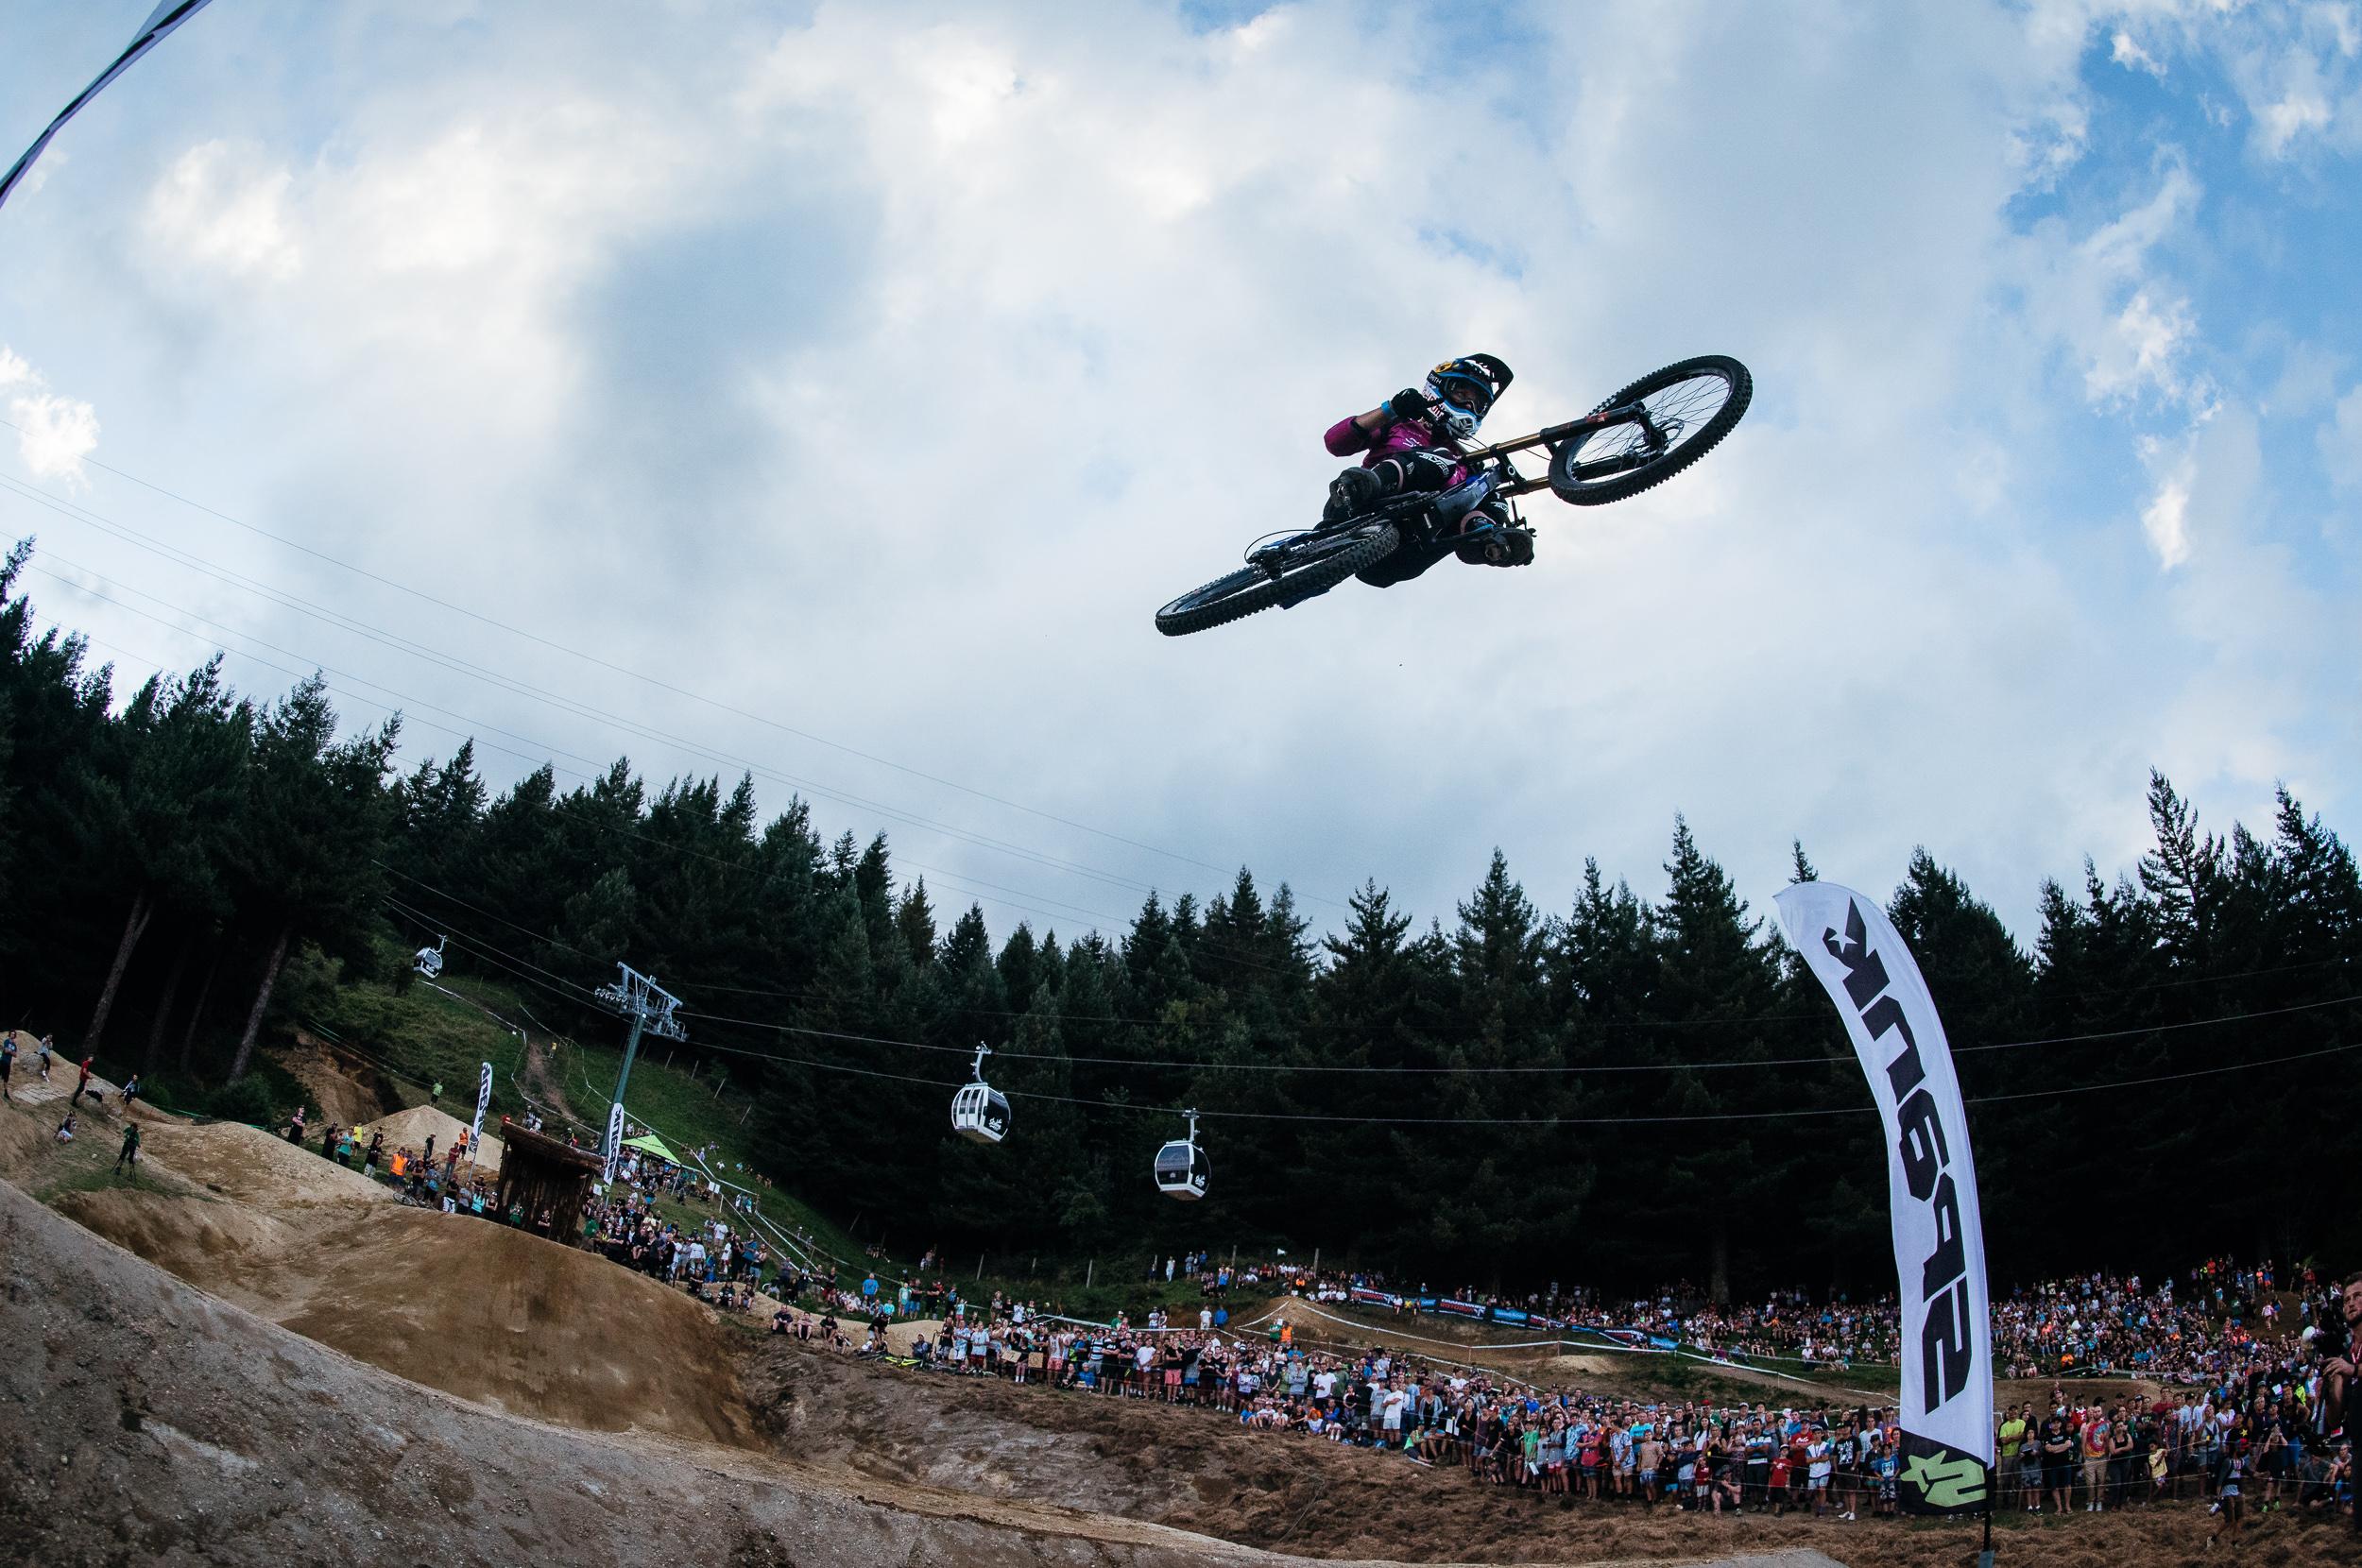 Photo : Paris Gore - Whip off